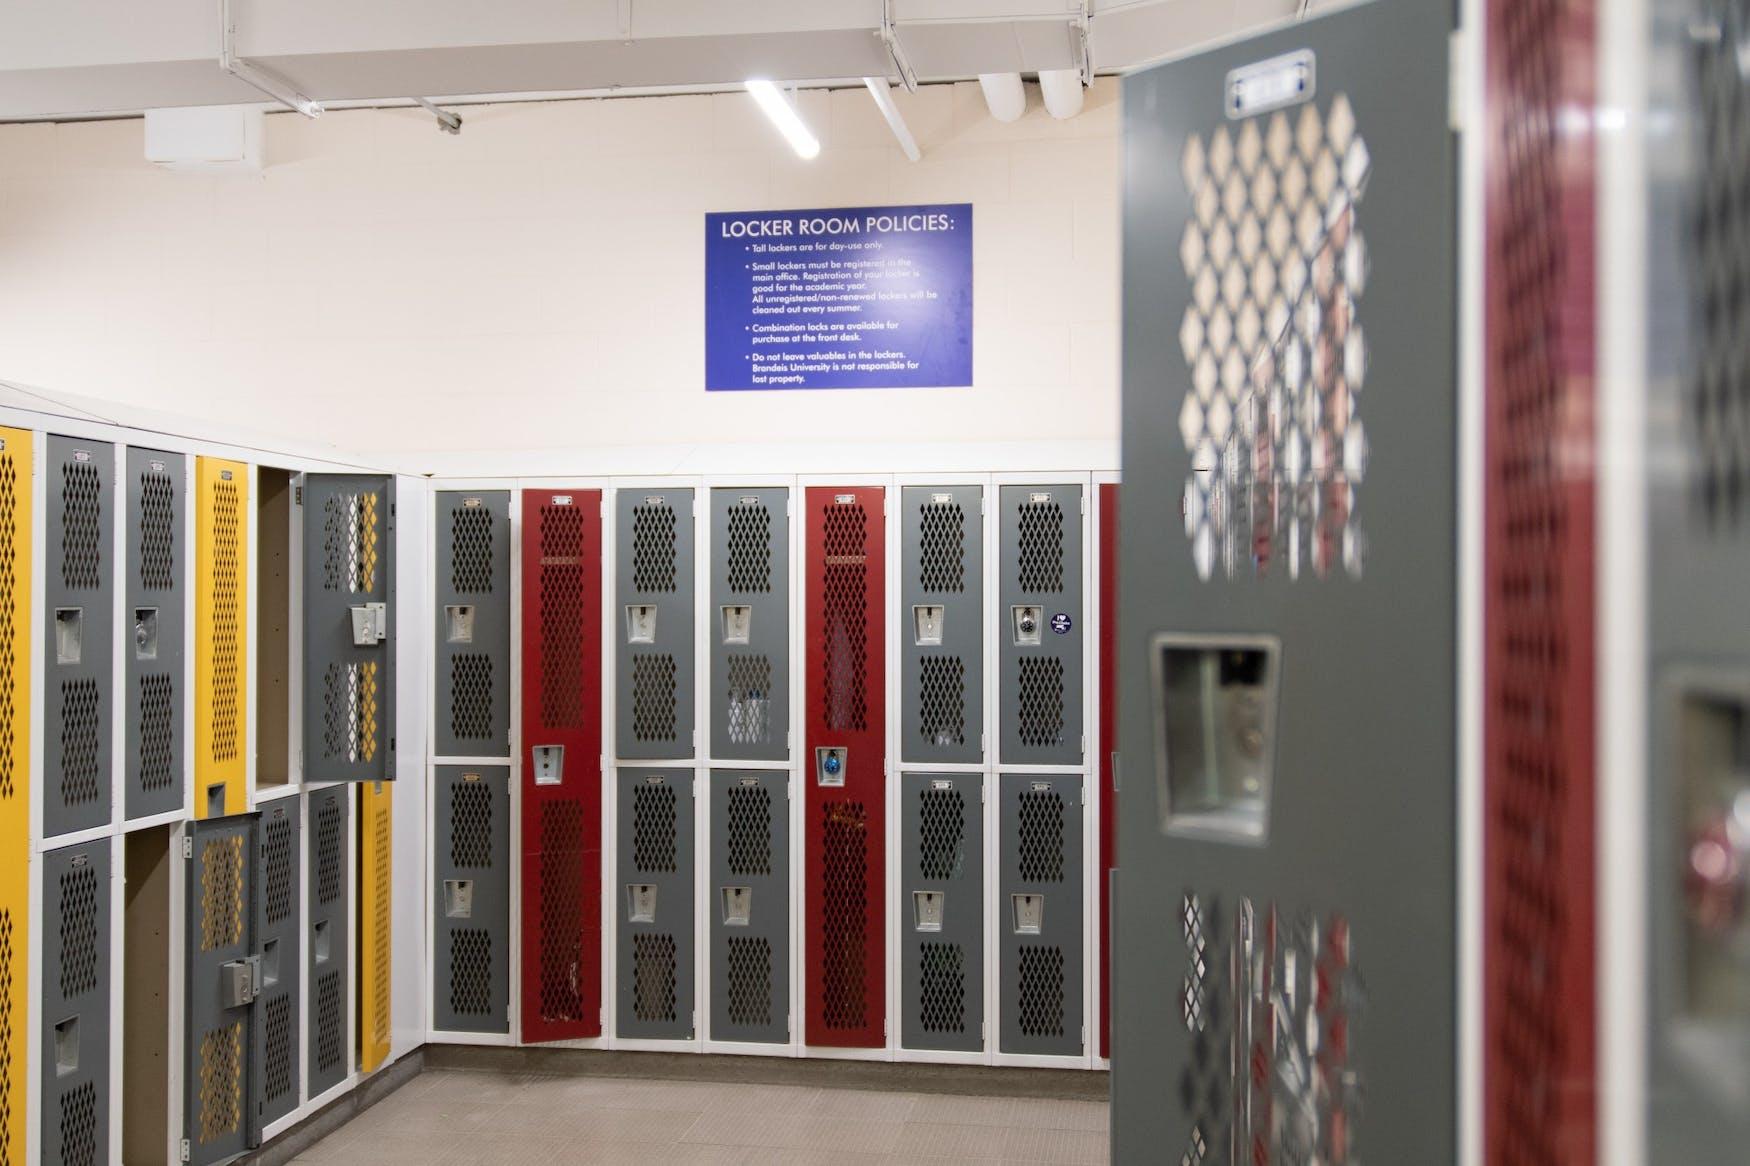 womens-locker-room-1-18-20-nw-0042